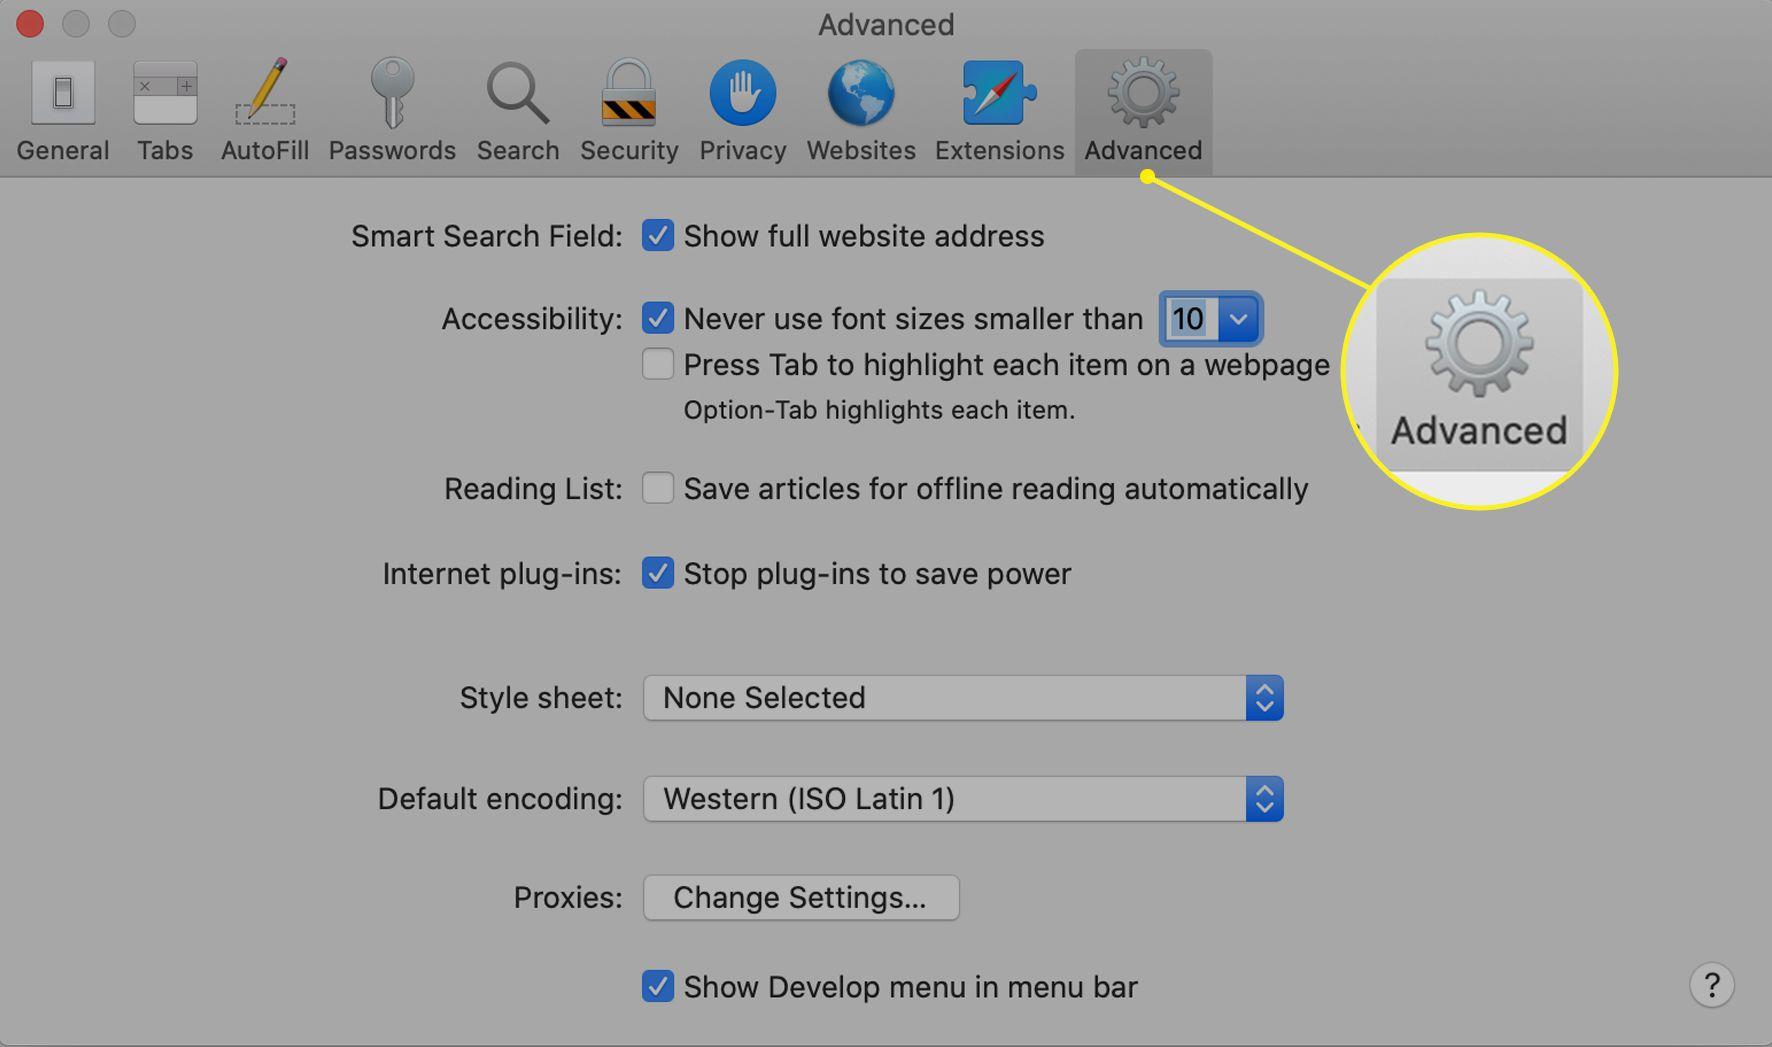 Safari preferences screen with Advanced tab selected